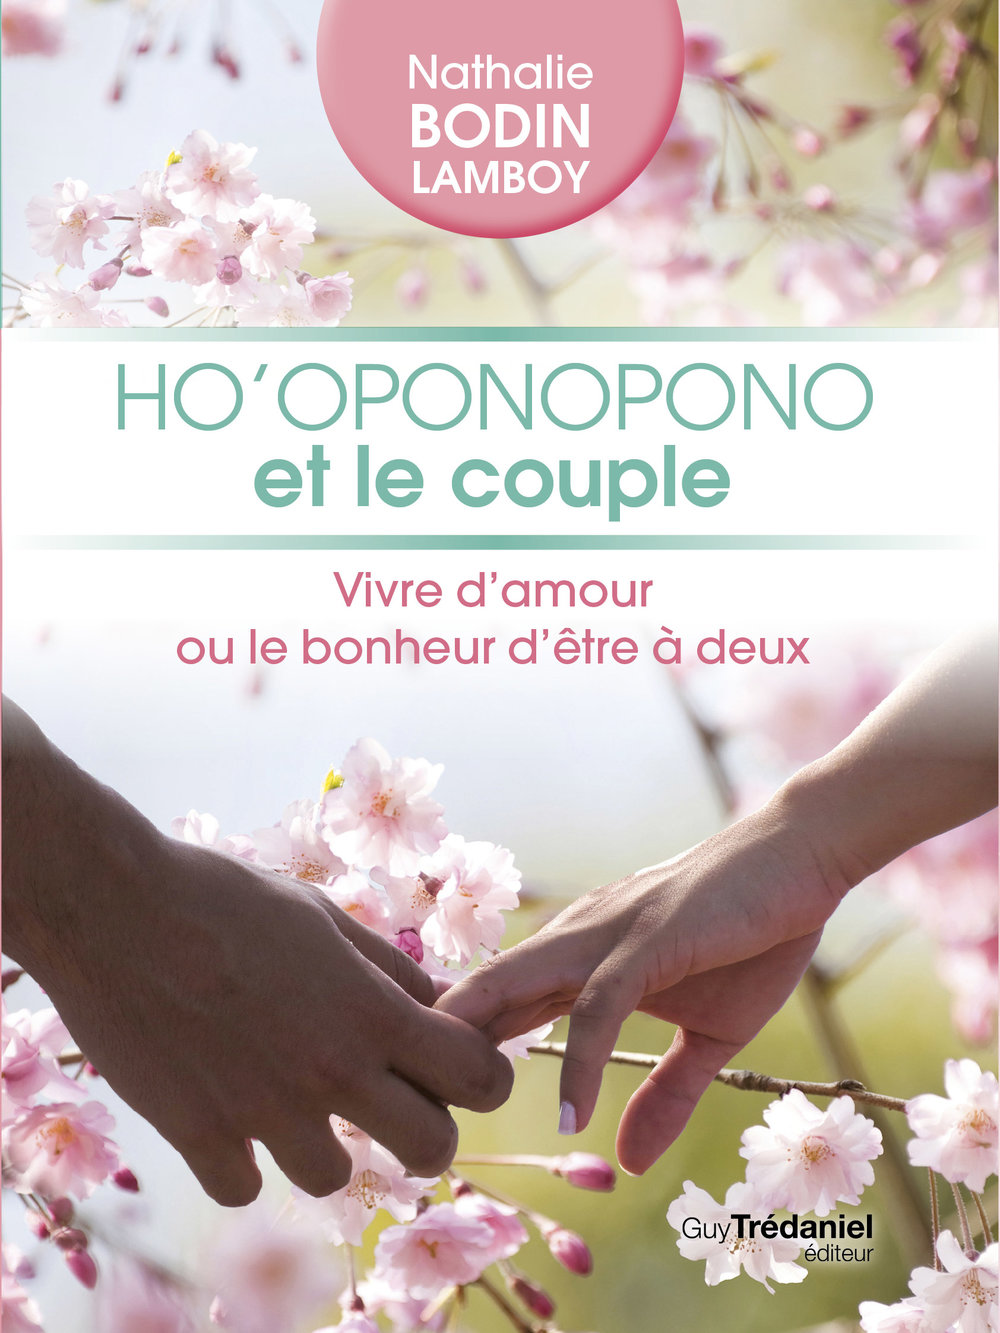 HoponoponoCouple.jpg